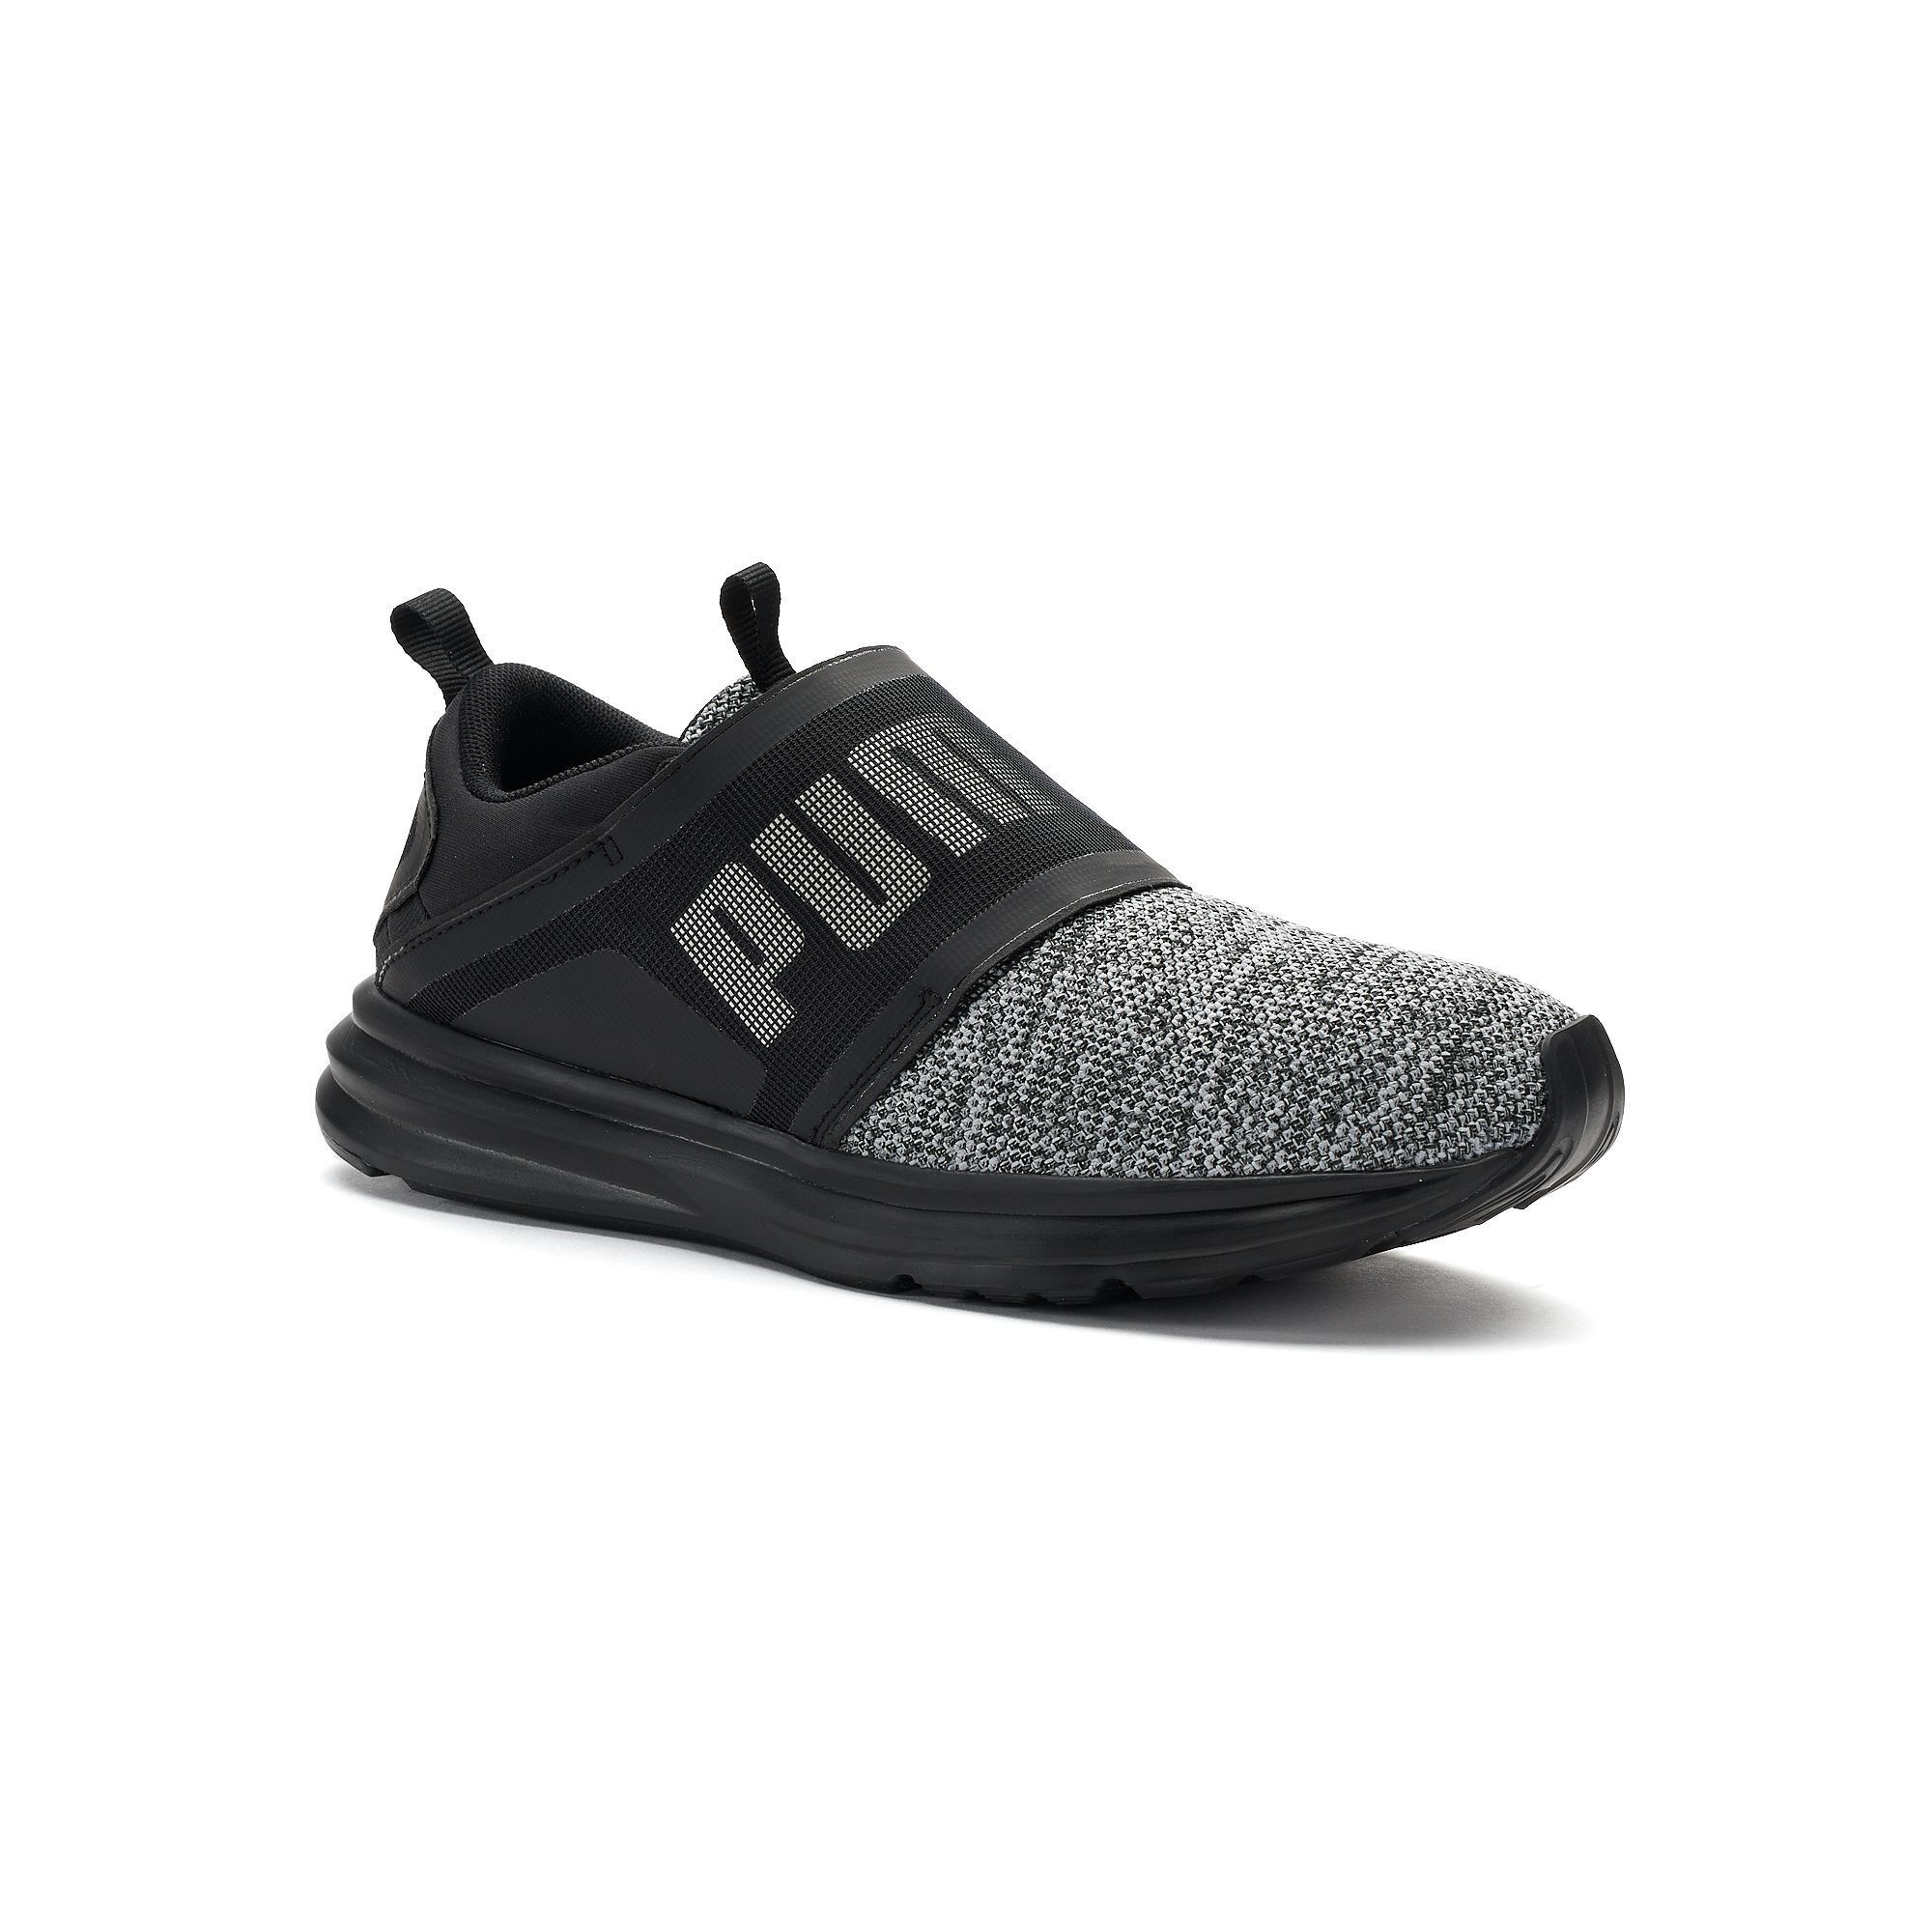 e648414b59cb PUMA Enzo Strap Knit Women s Sneakers